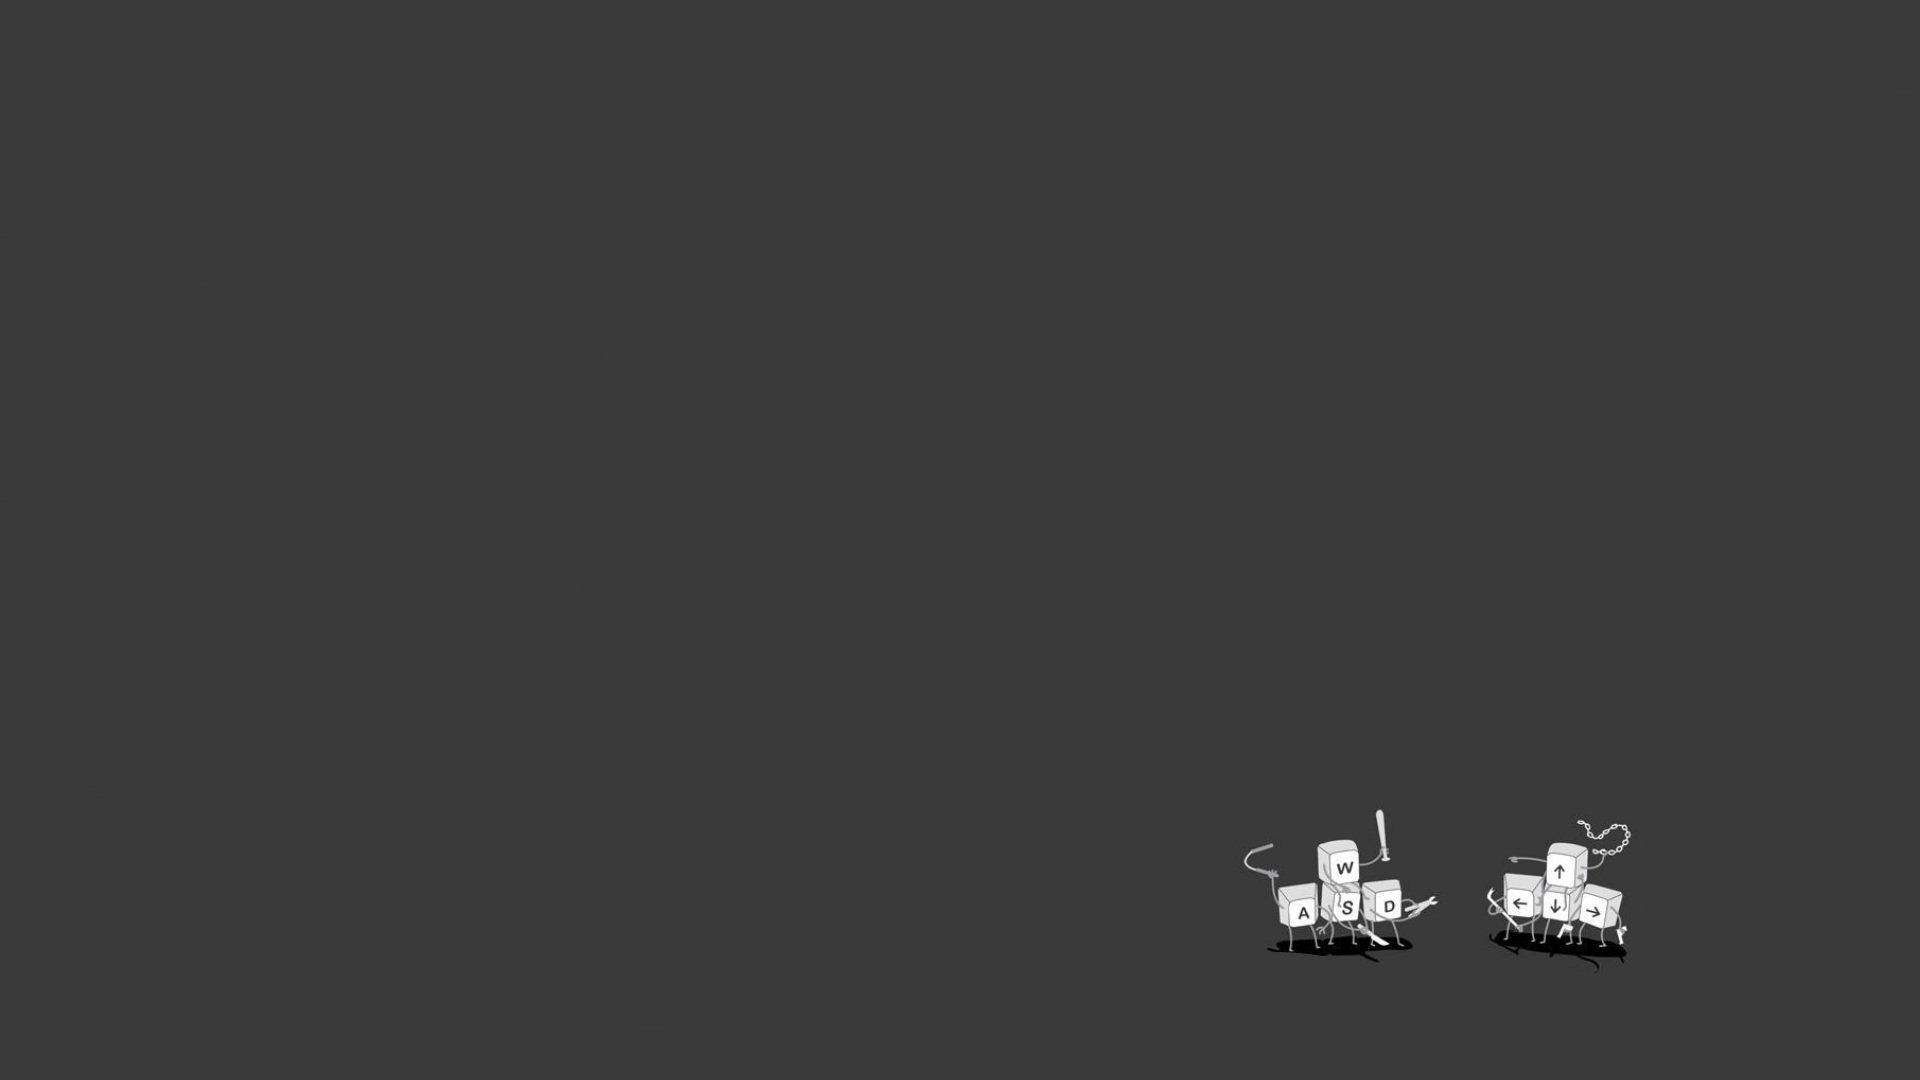 Minimalistic computers funny simplistic simple wallpaper | 1920x1080 .